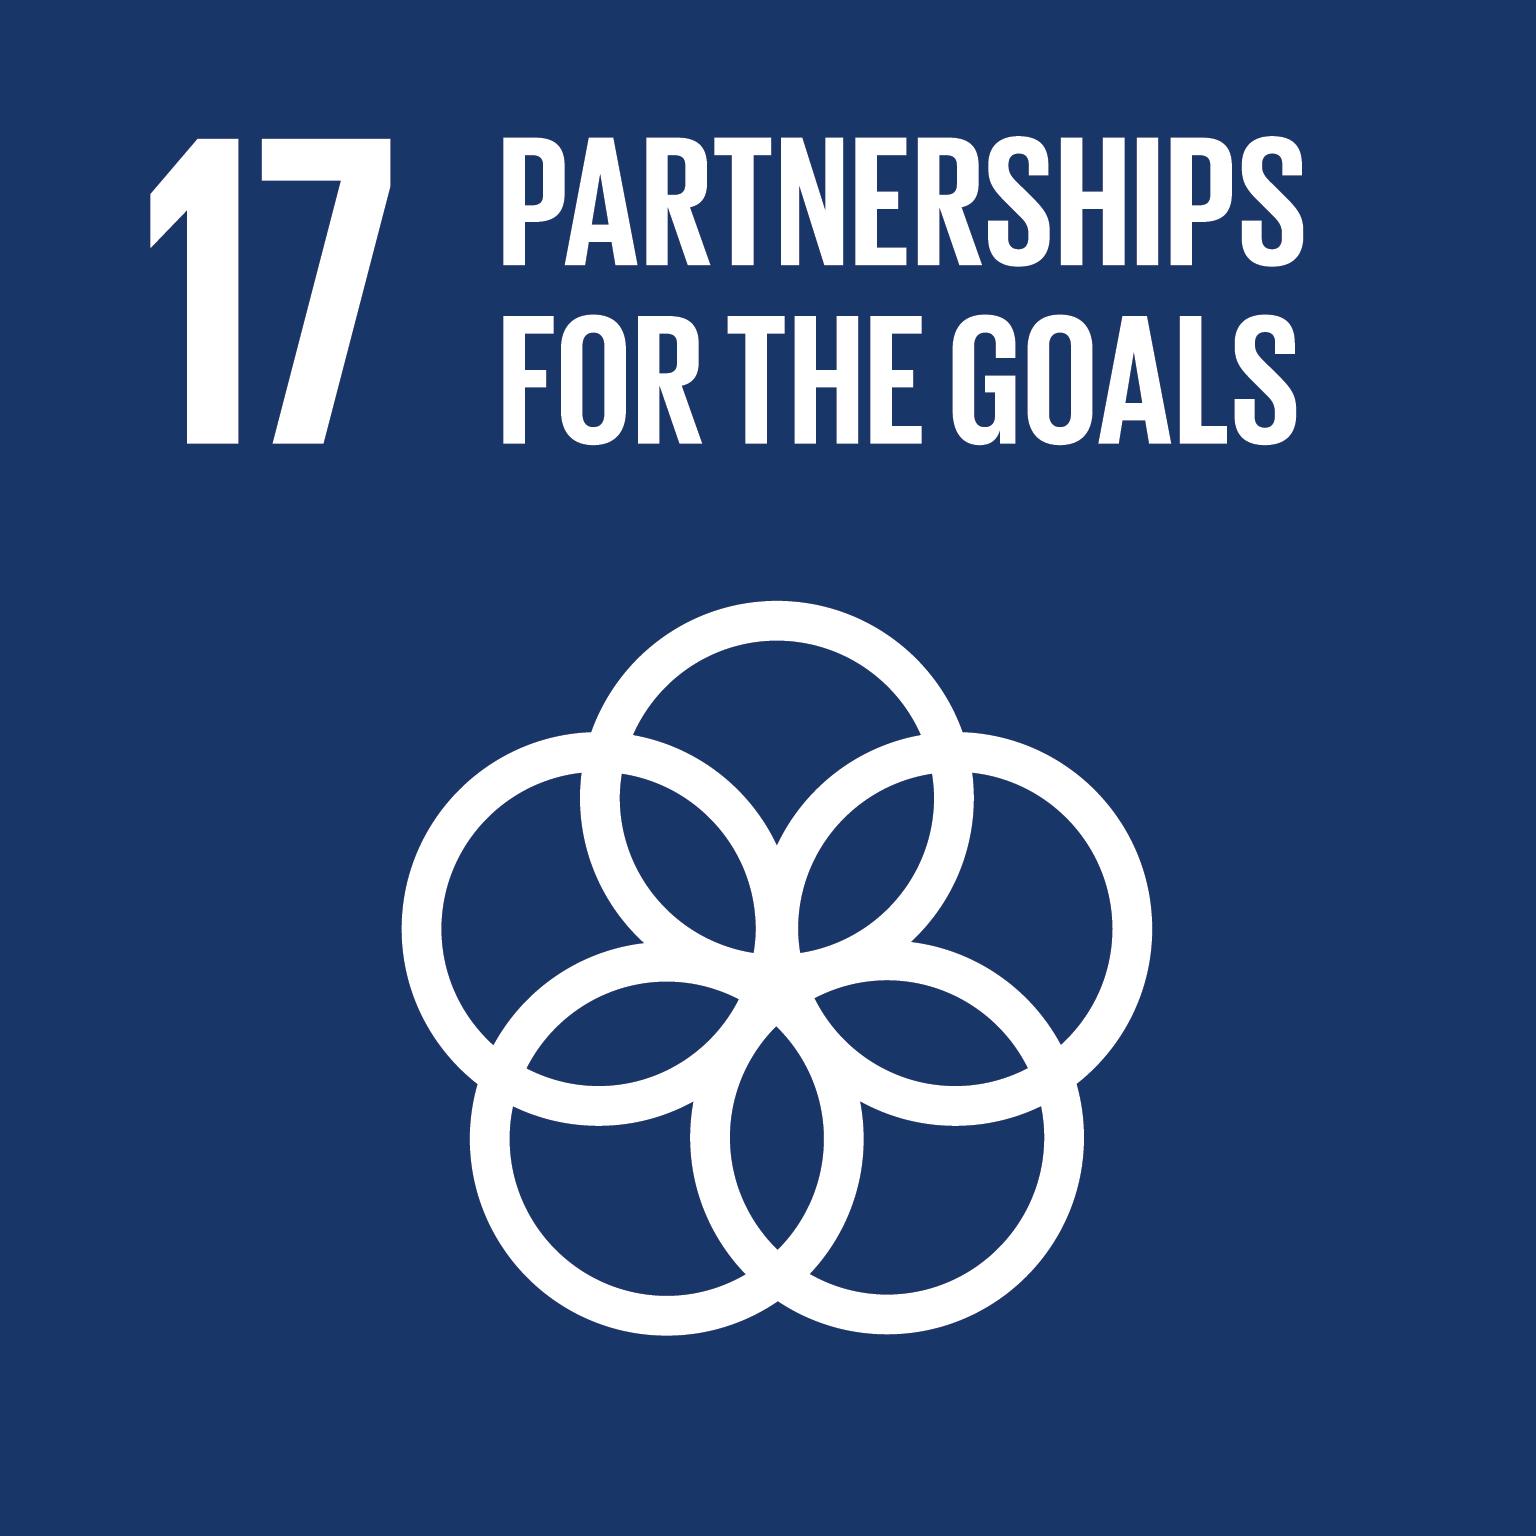 Partnerships for the Goals logo